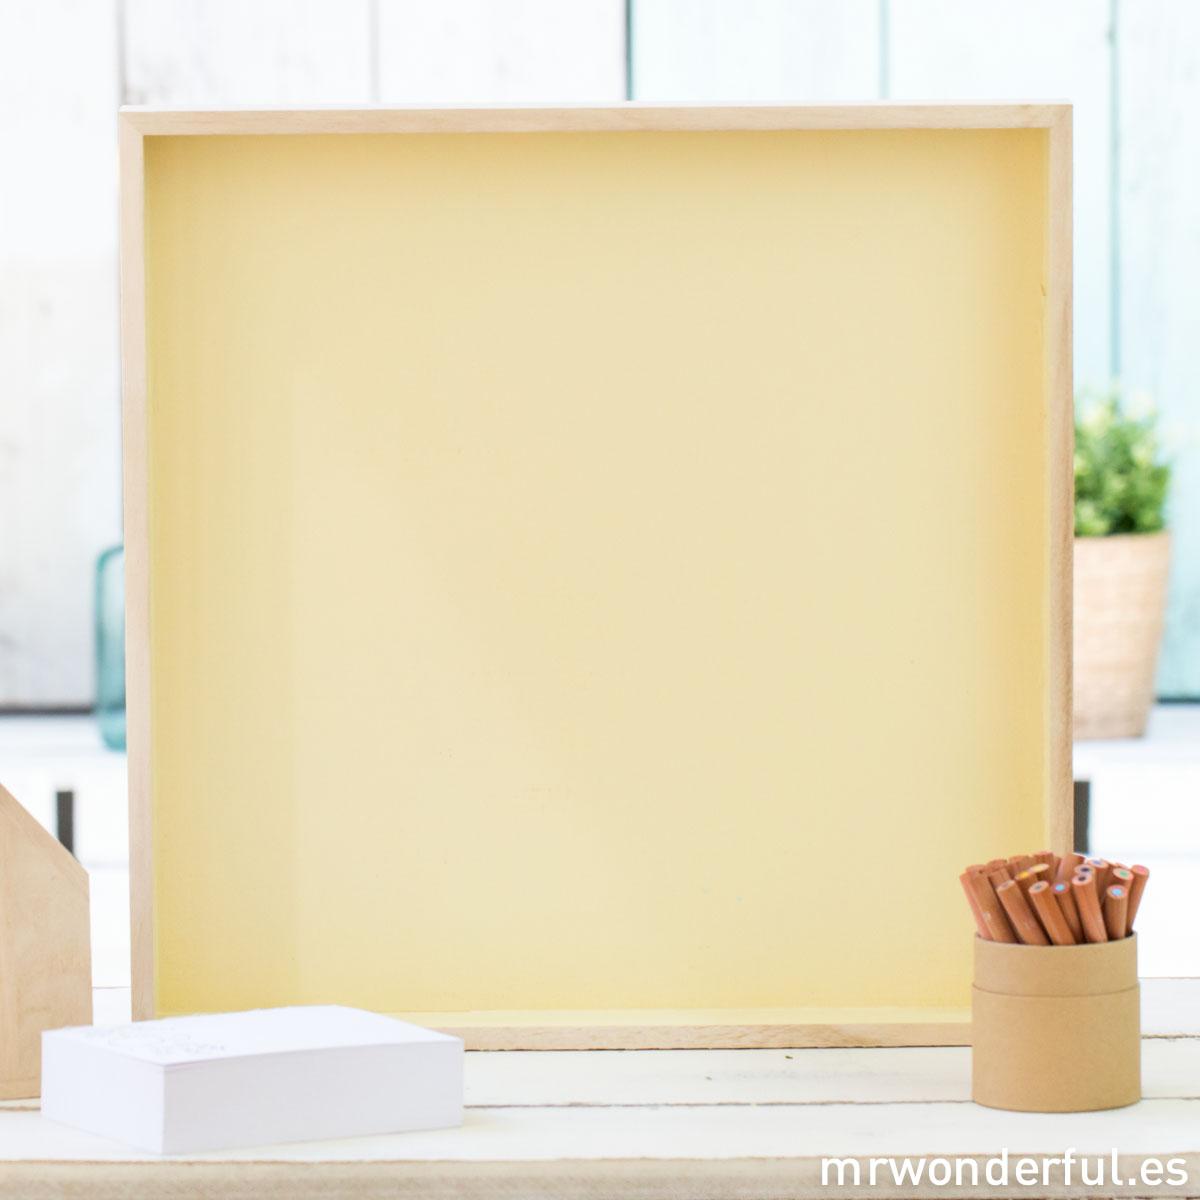 mrwonderful_50200079_bandeja-cuadrada-madera_base-amarillo-1